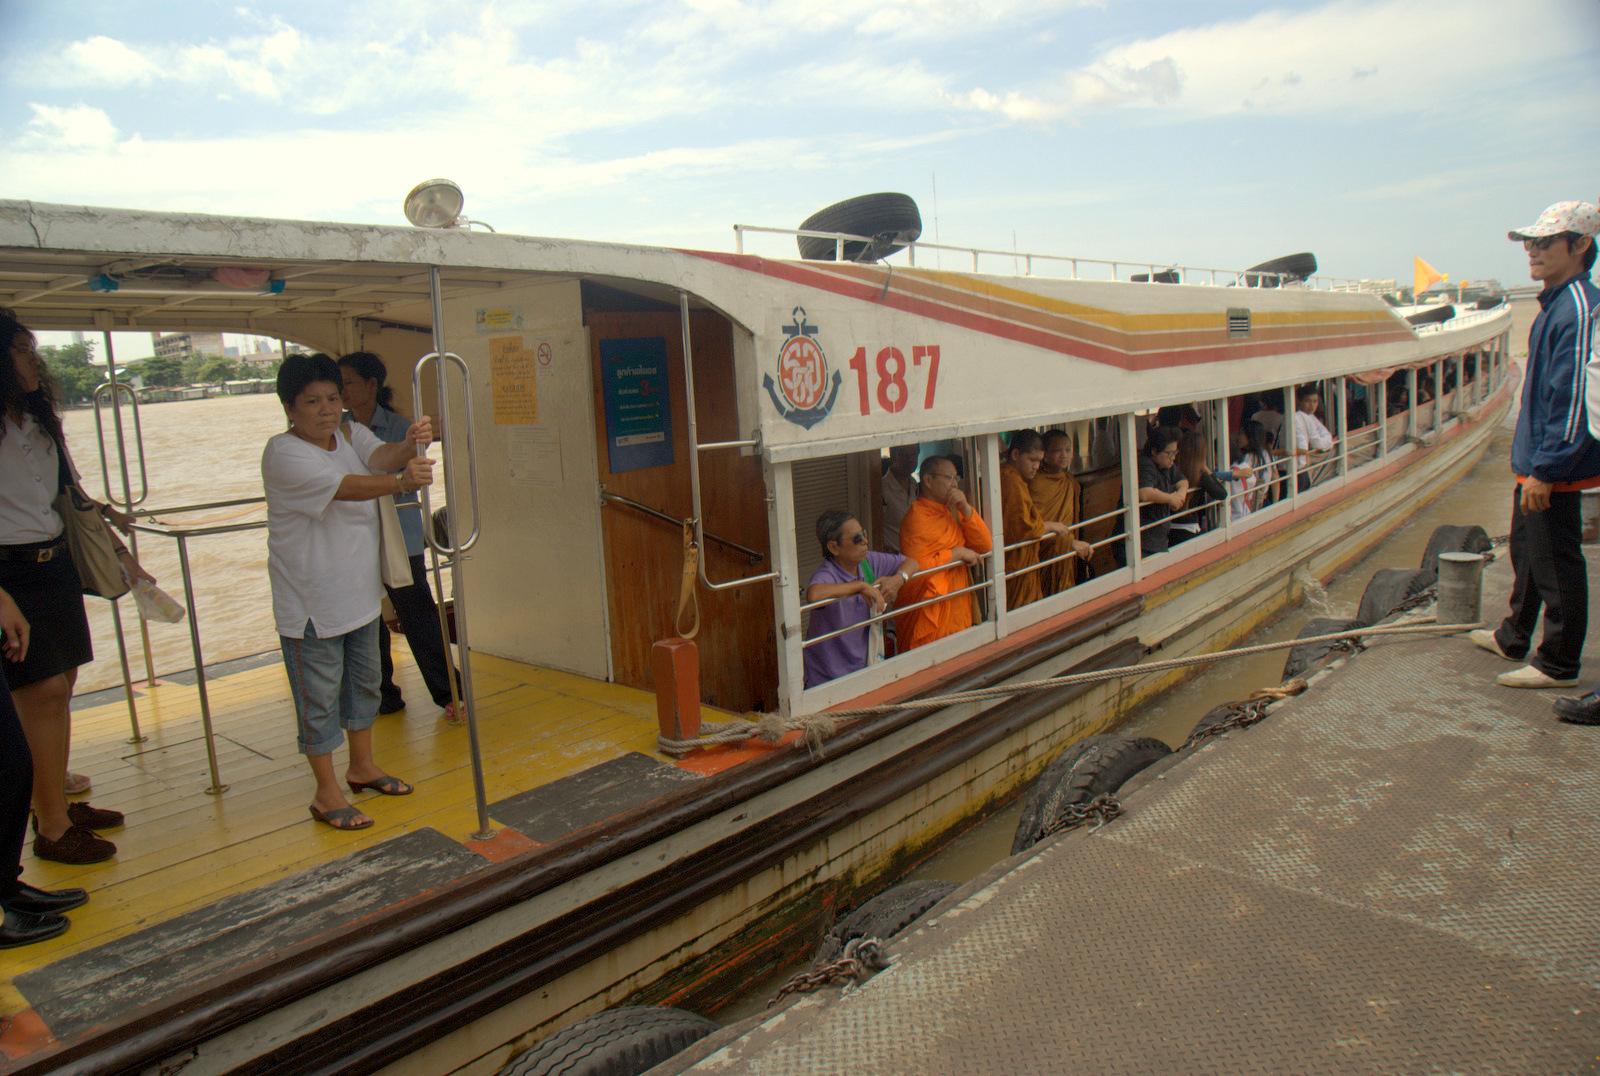 Bangkok (ostatni spacer autobusem i rzeką) 6